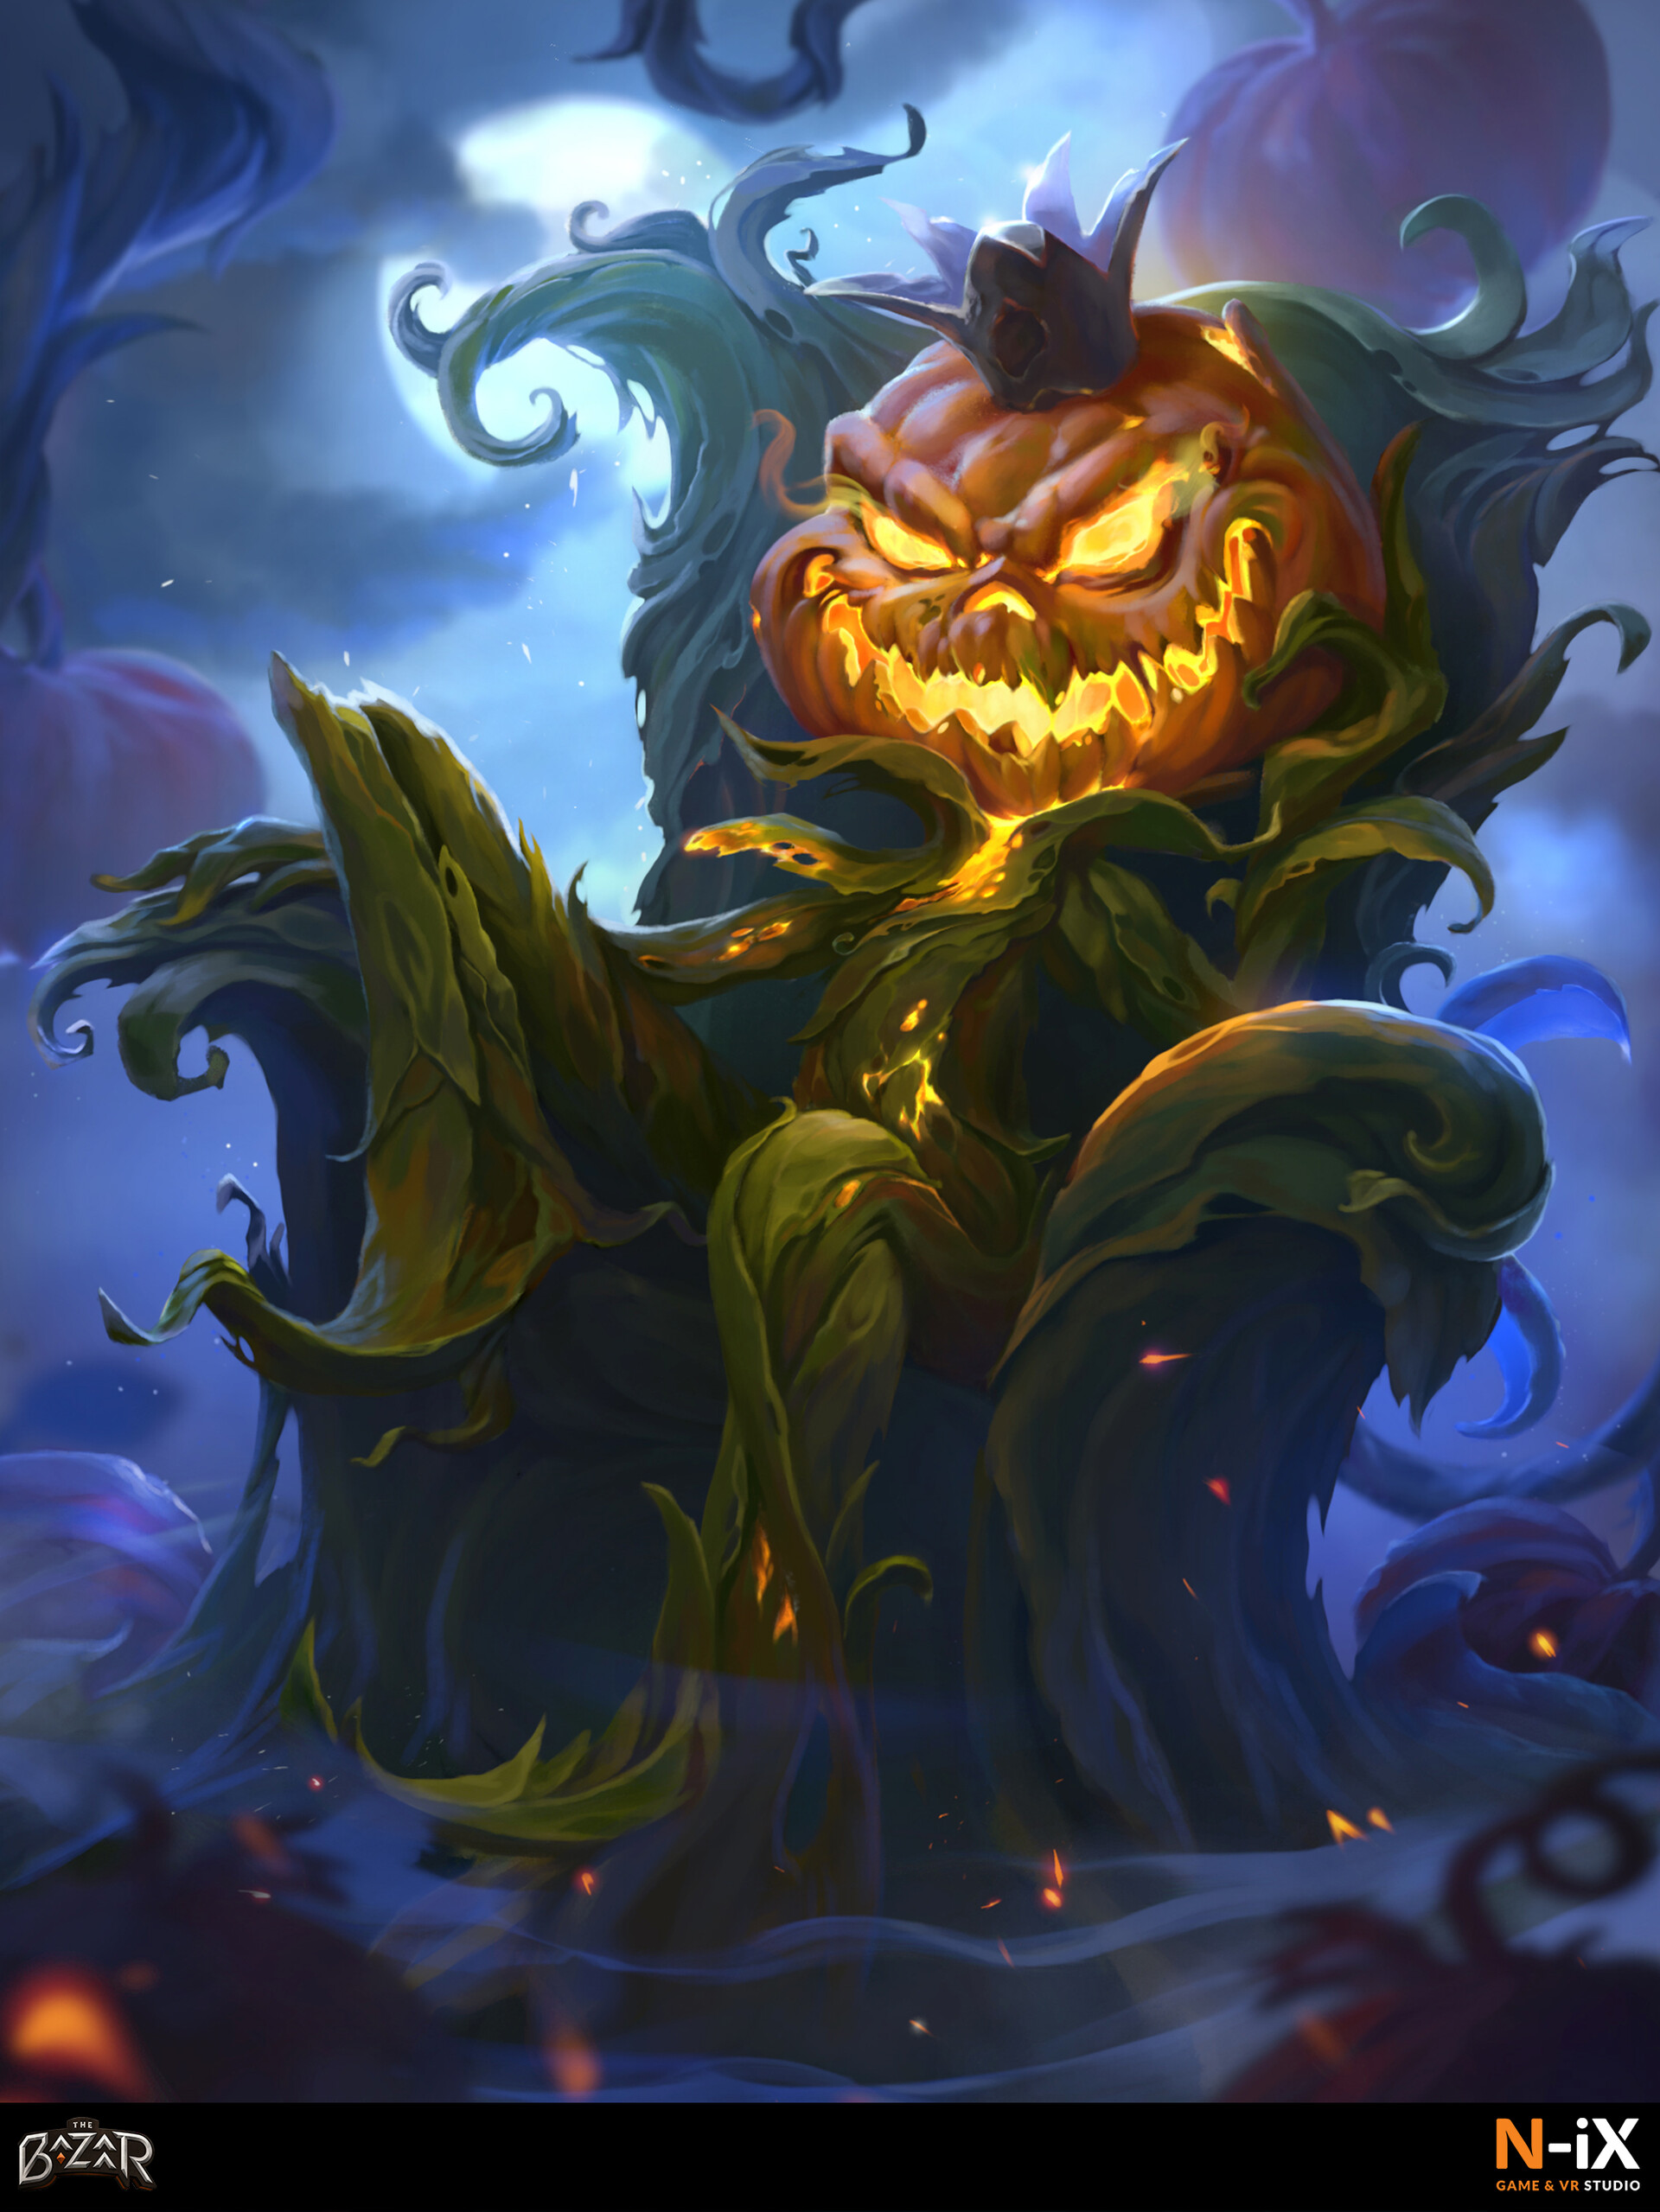 The Bazaar Pumpkin king card artwork based on backers description